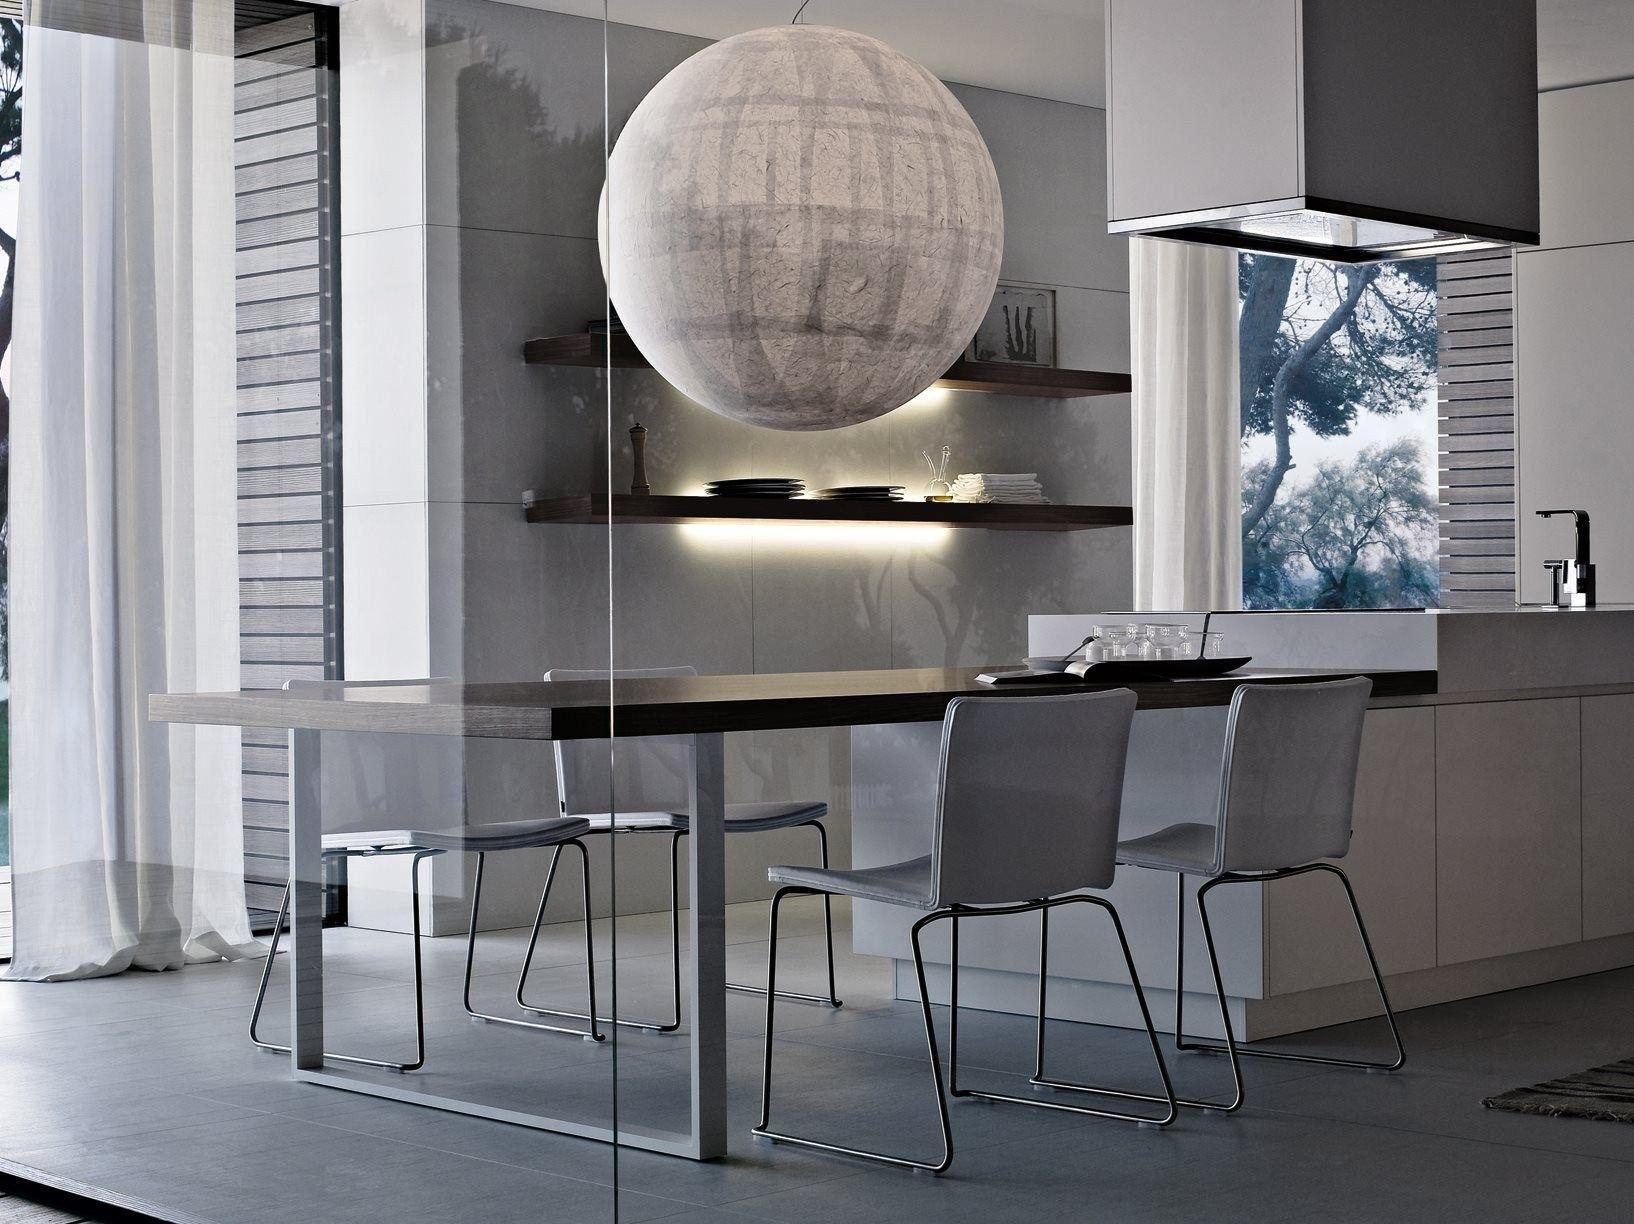 Home products chairs ics ipsilon - Home Products Chairs Ics Ipsilon 25